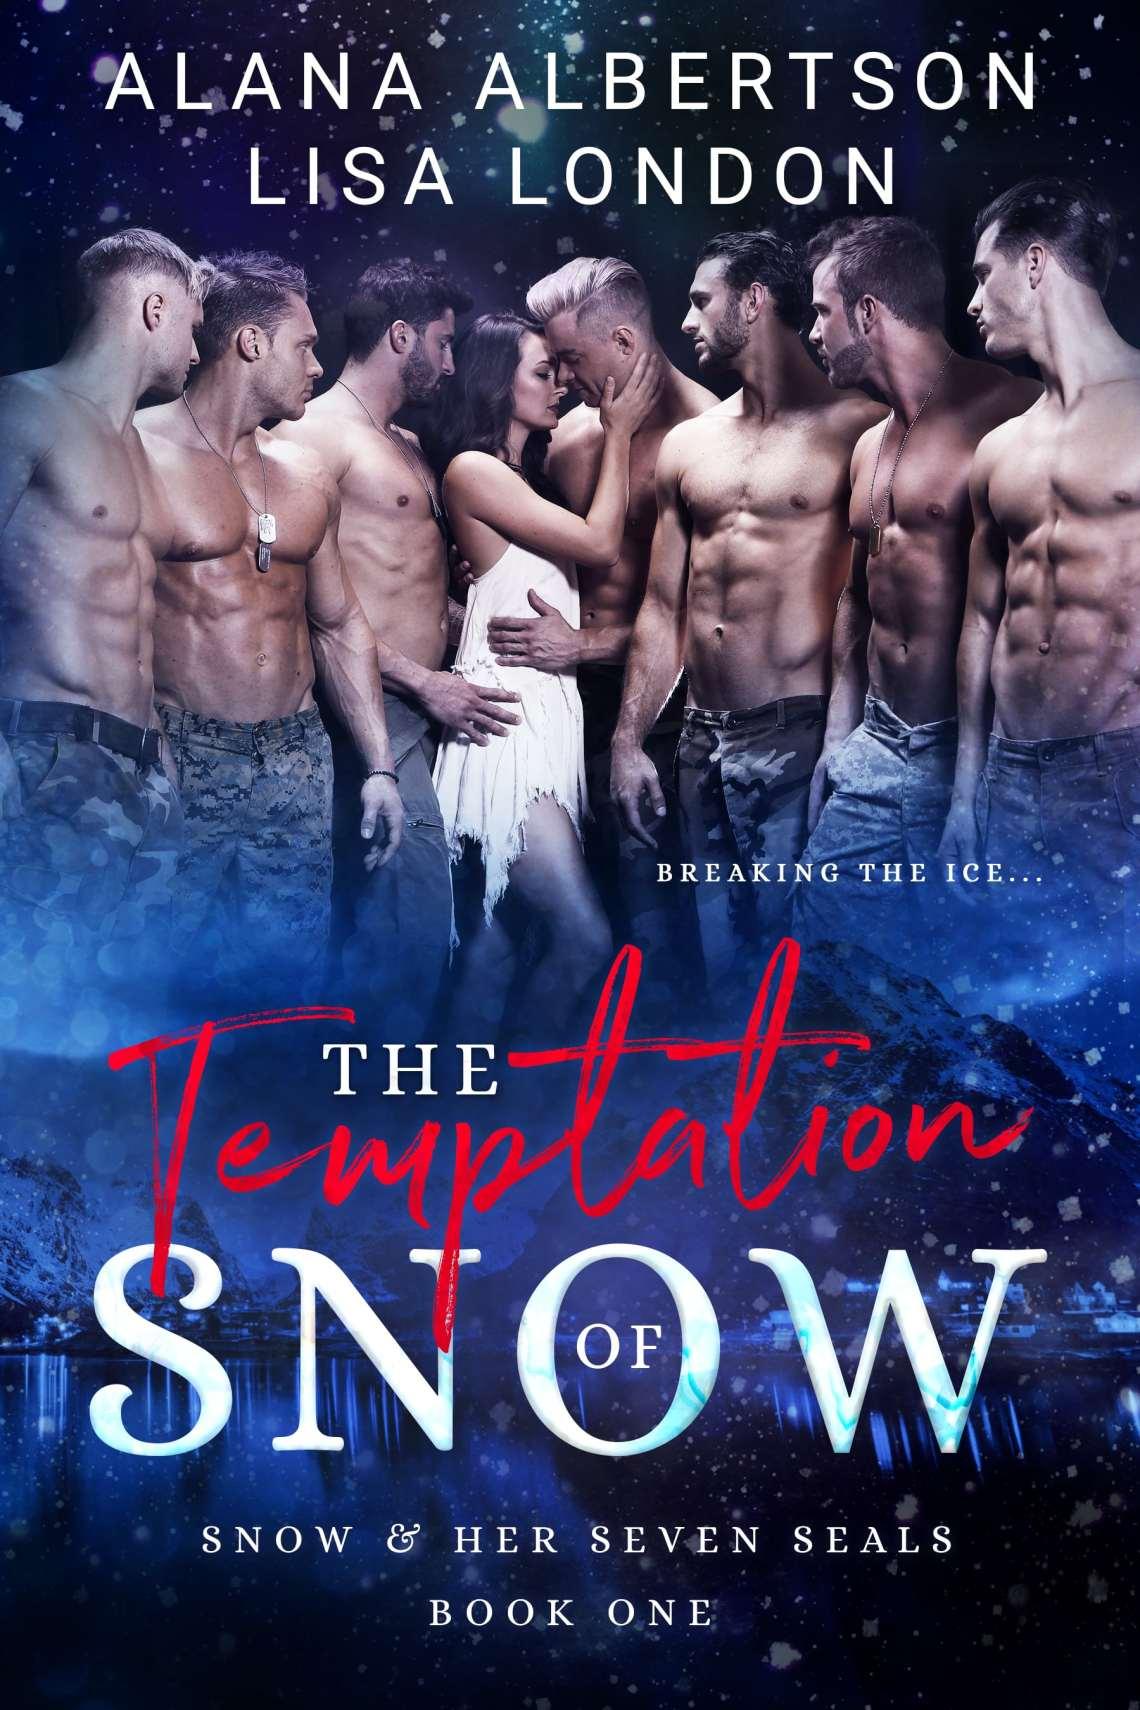 The Temptation of Snow